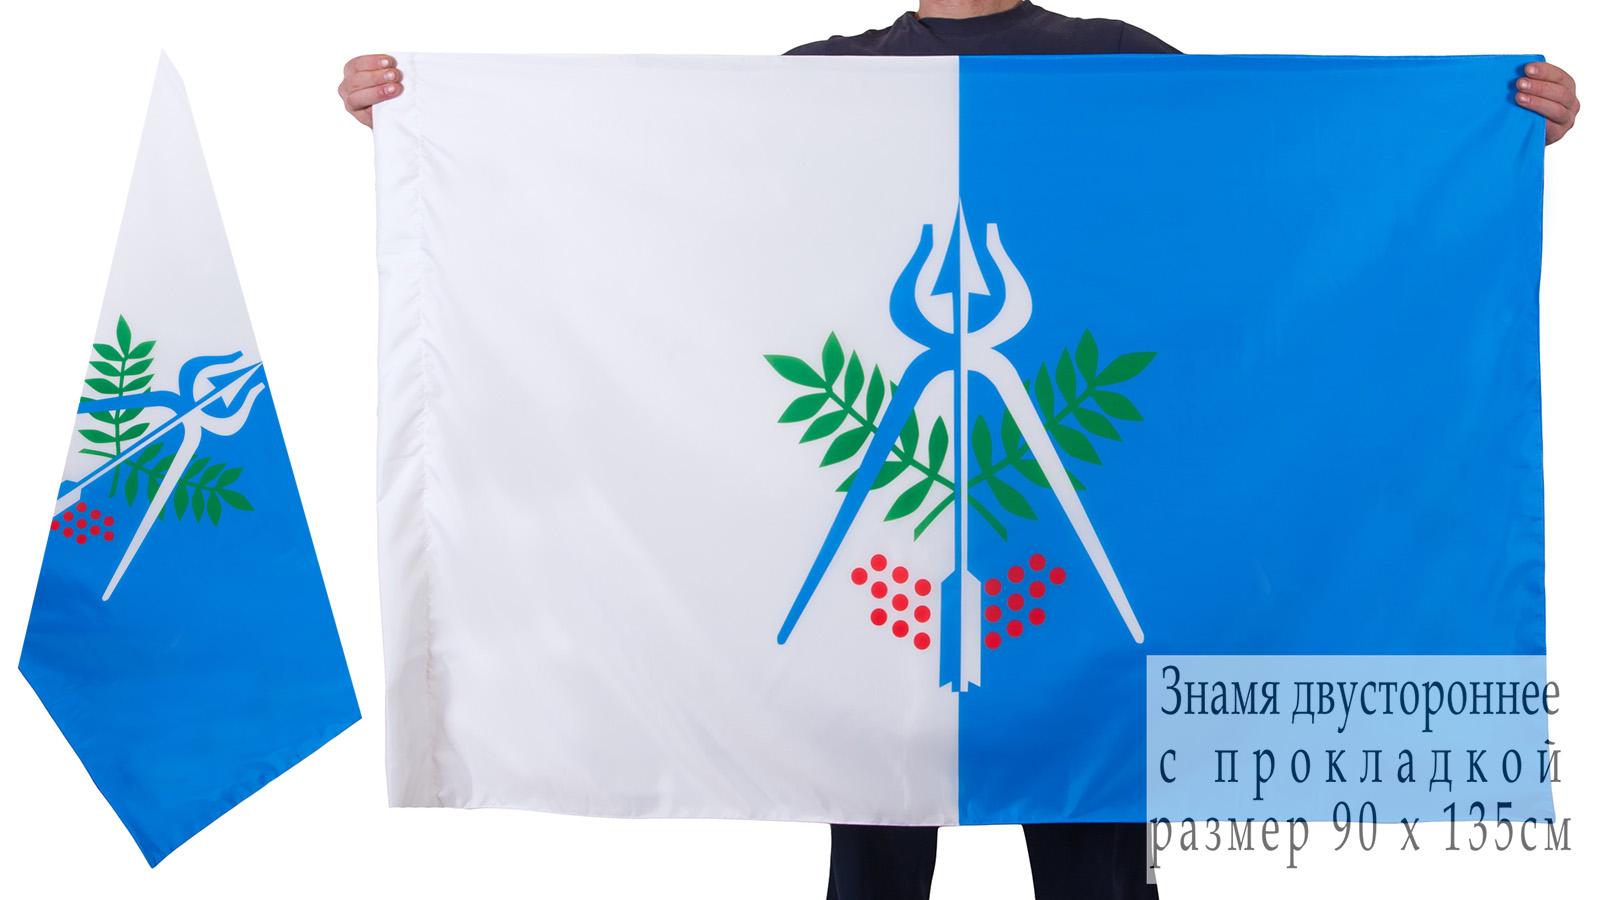 Двухсторонний флаг Ижевска